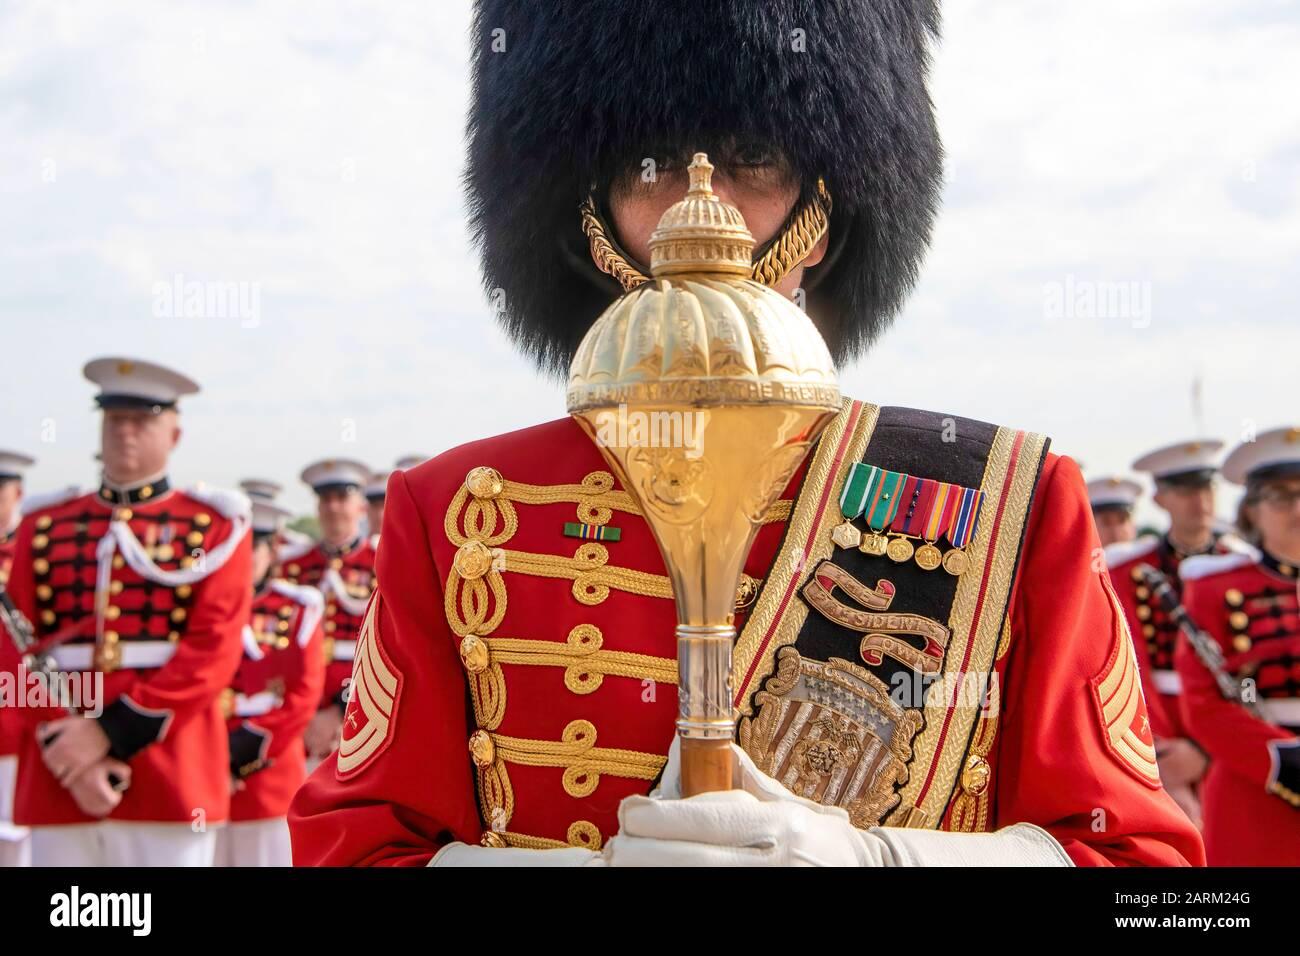 The United States Marine Band takes part in the honor cordon as U.S. Secretary of Defense Dr. Mark T. Esper welcomes German Minister of Defense Annegret Kramp-Karrenbauer to the Pentagon, Washington, D.C., Sept. 23, 2019. (DoD photo by Lisa Ferdinando) Stock Photo